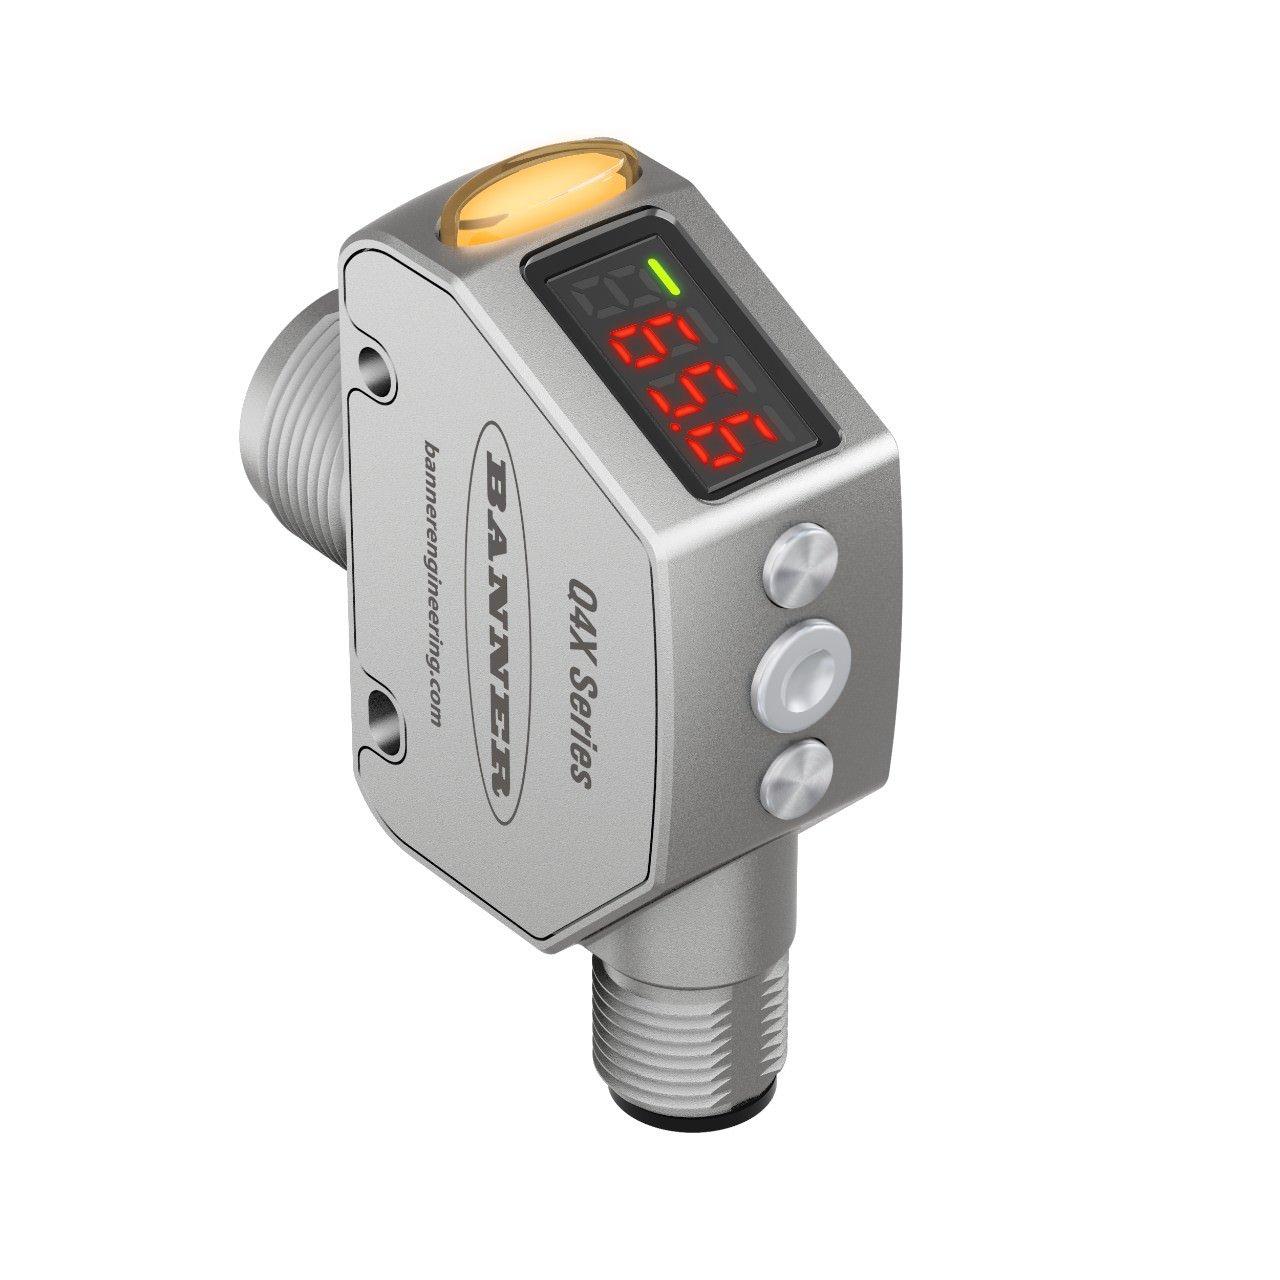 Laser Sensor, Q4X Series, Adjustable, 25 mm to 300 mm, NPN / PNP, 10 to 30 Vdc